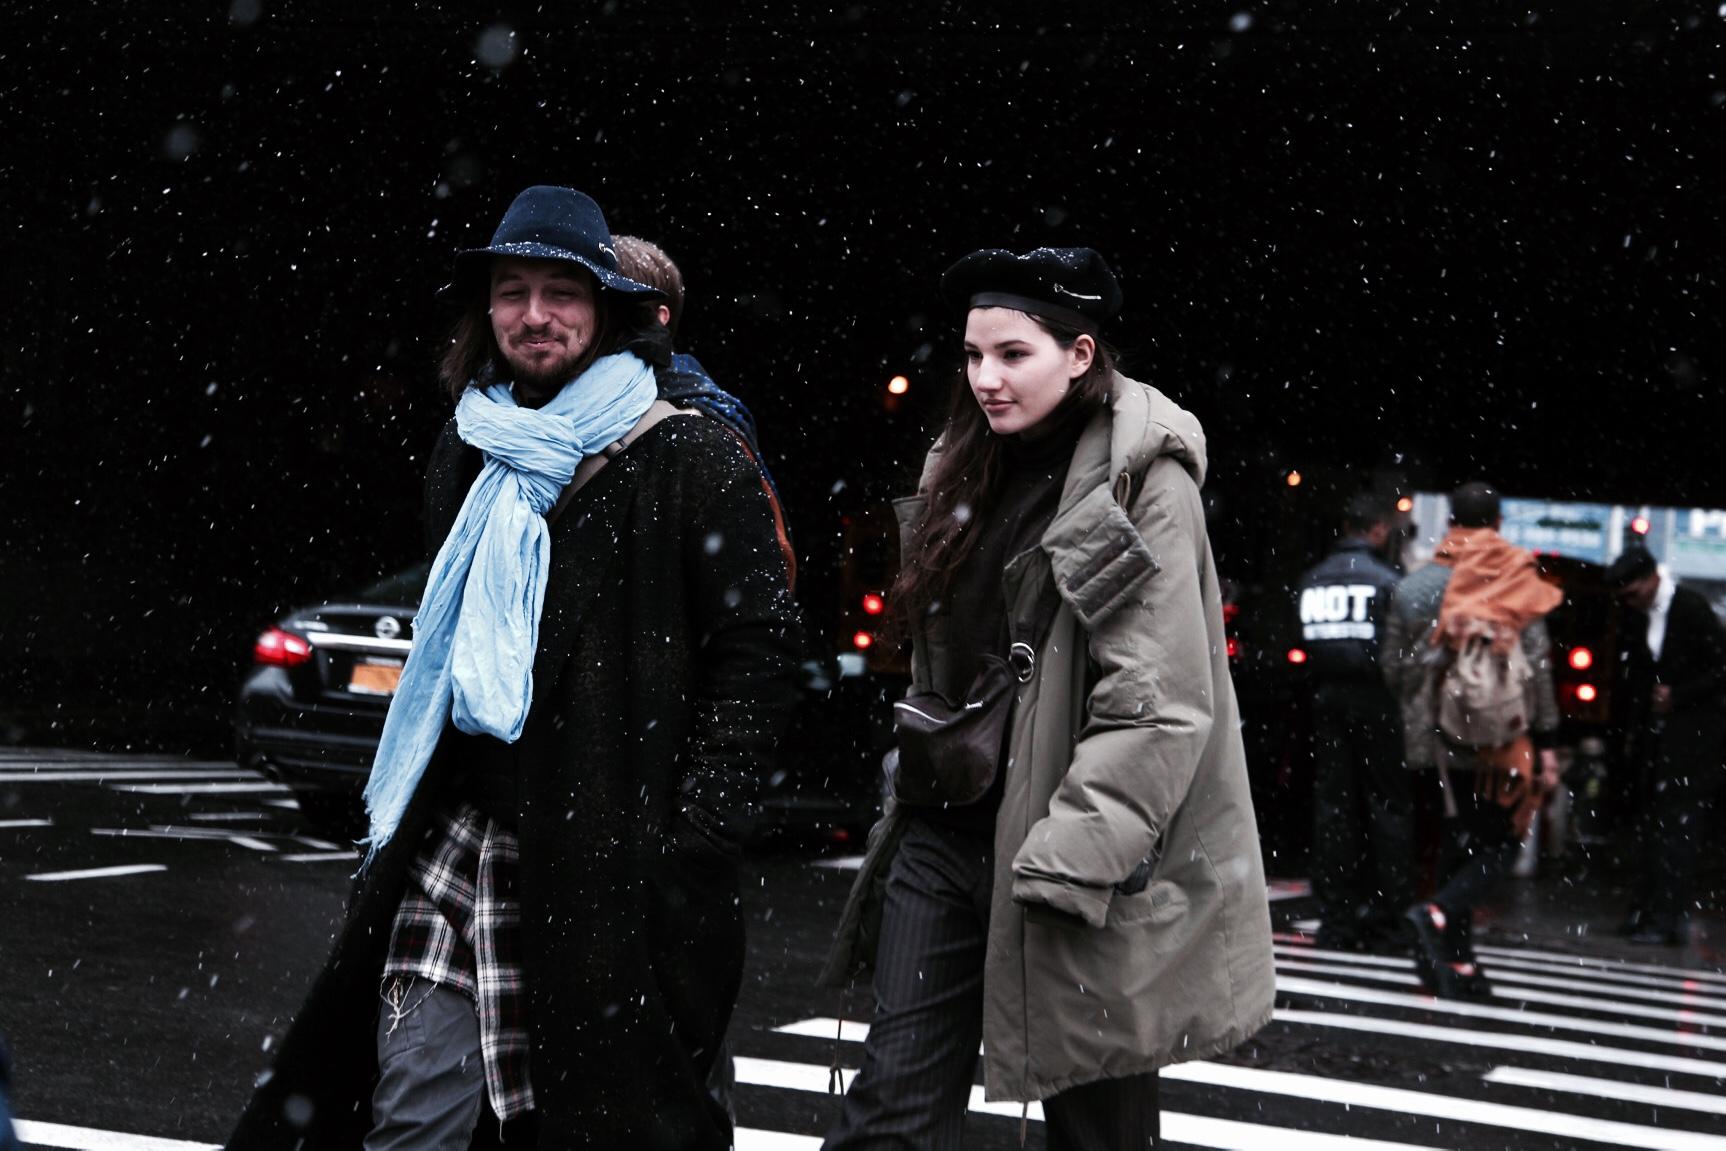 fashion-week-hiver-2017-new-york-street-looks-aline-velter-folkr-20